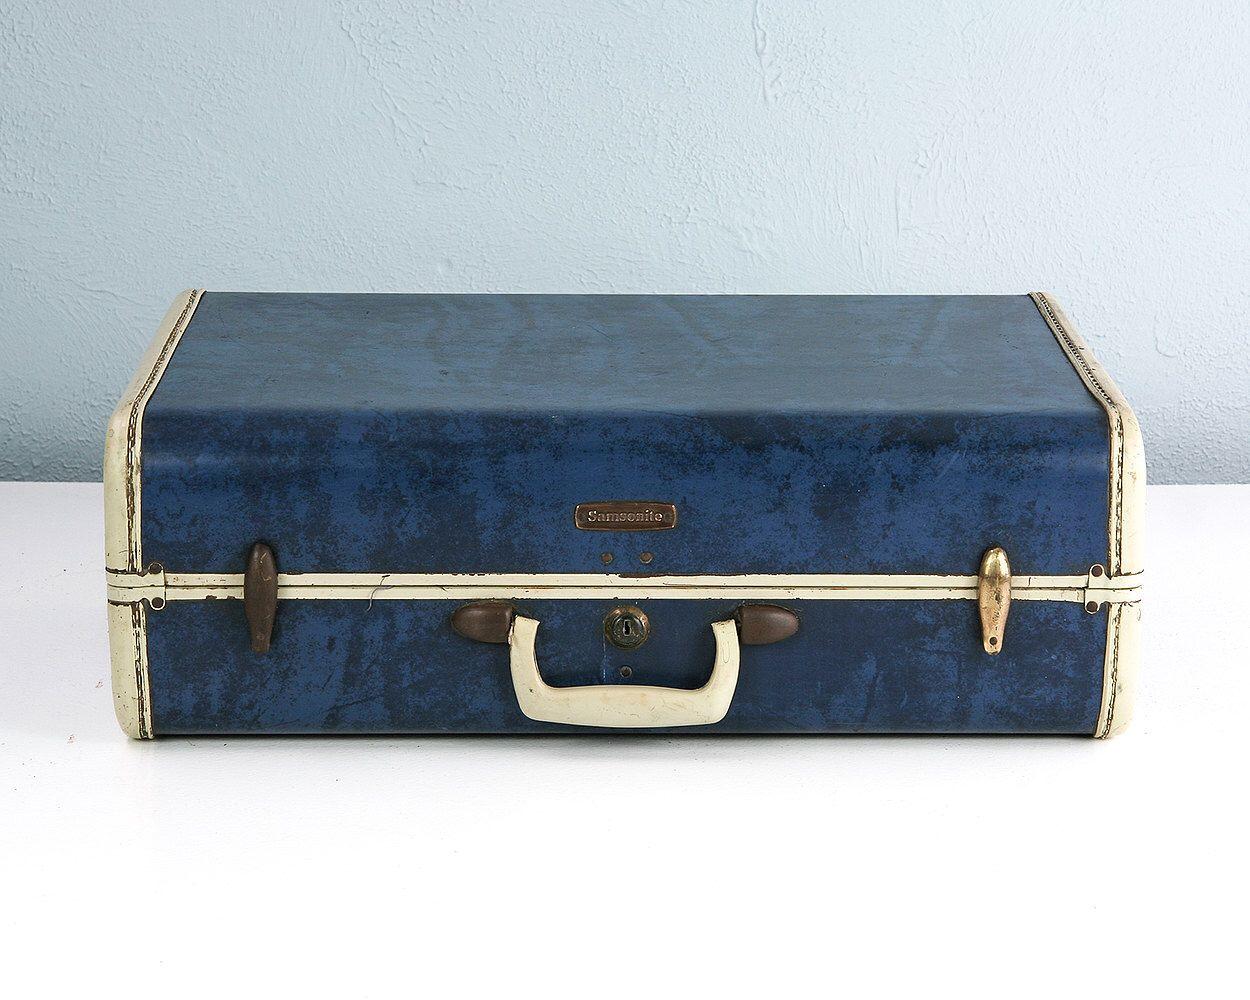 Vintage Blue Marble Samsonite Suitcase, Blue Suitcase, Vintage ...